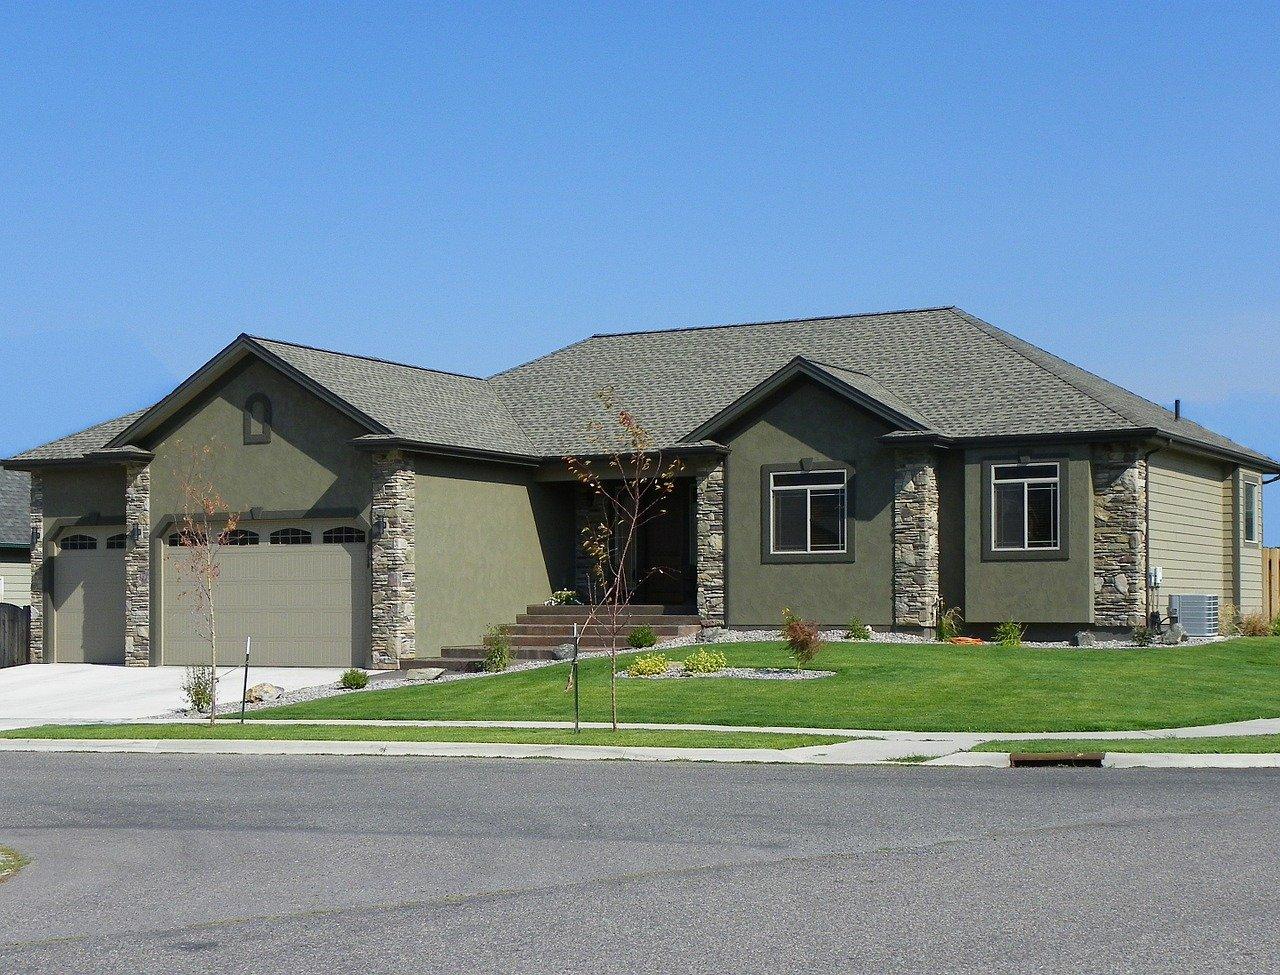 single-family-house-475877_1280